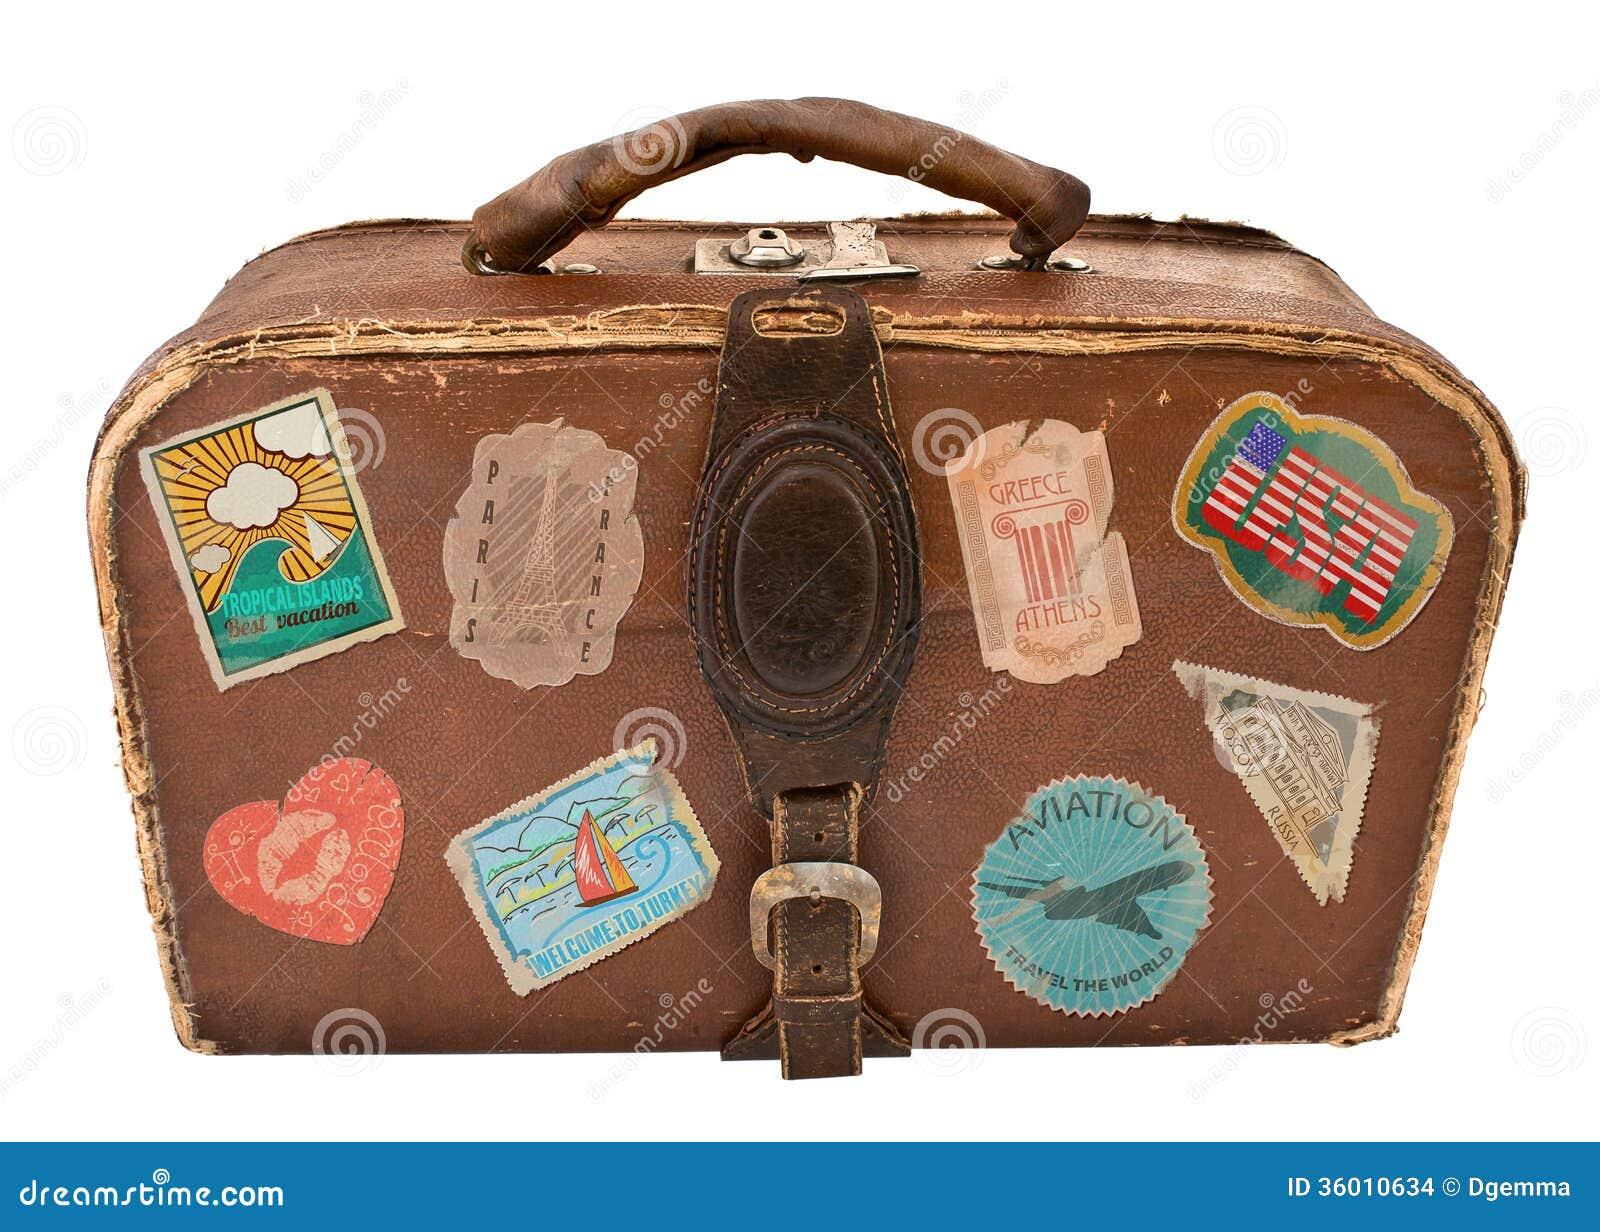 valise de voyage avec des autocollants images stock image 36010634. Black Bedroom Furniture Sets. Home Design Ideas